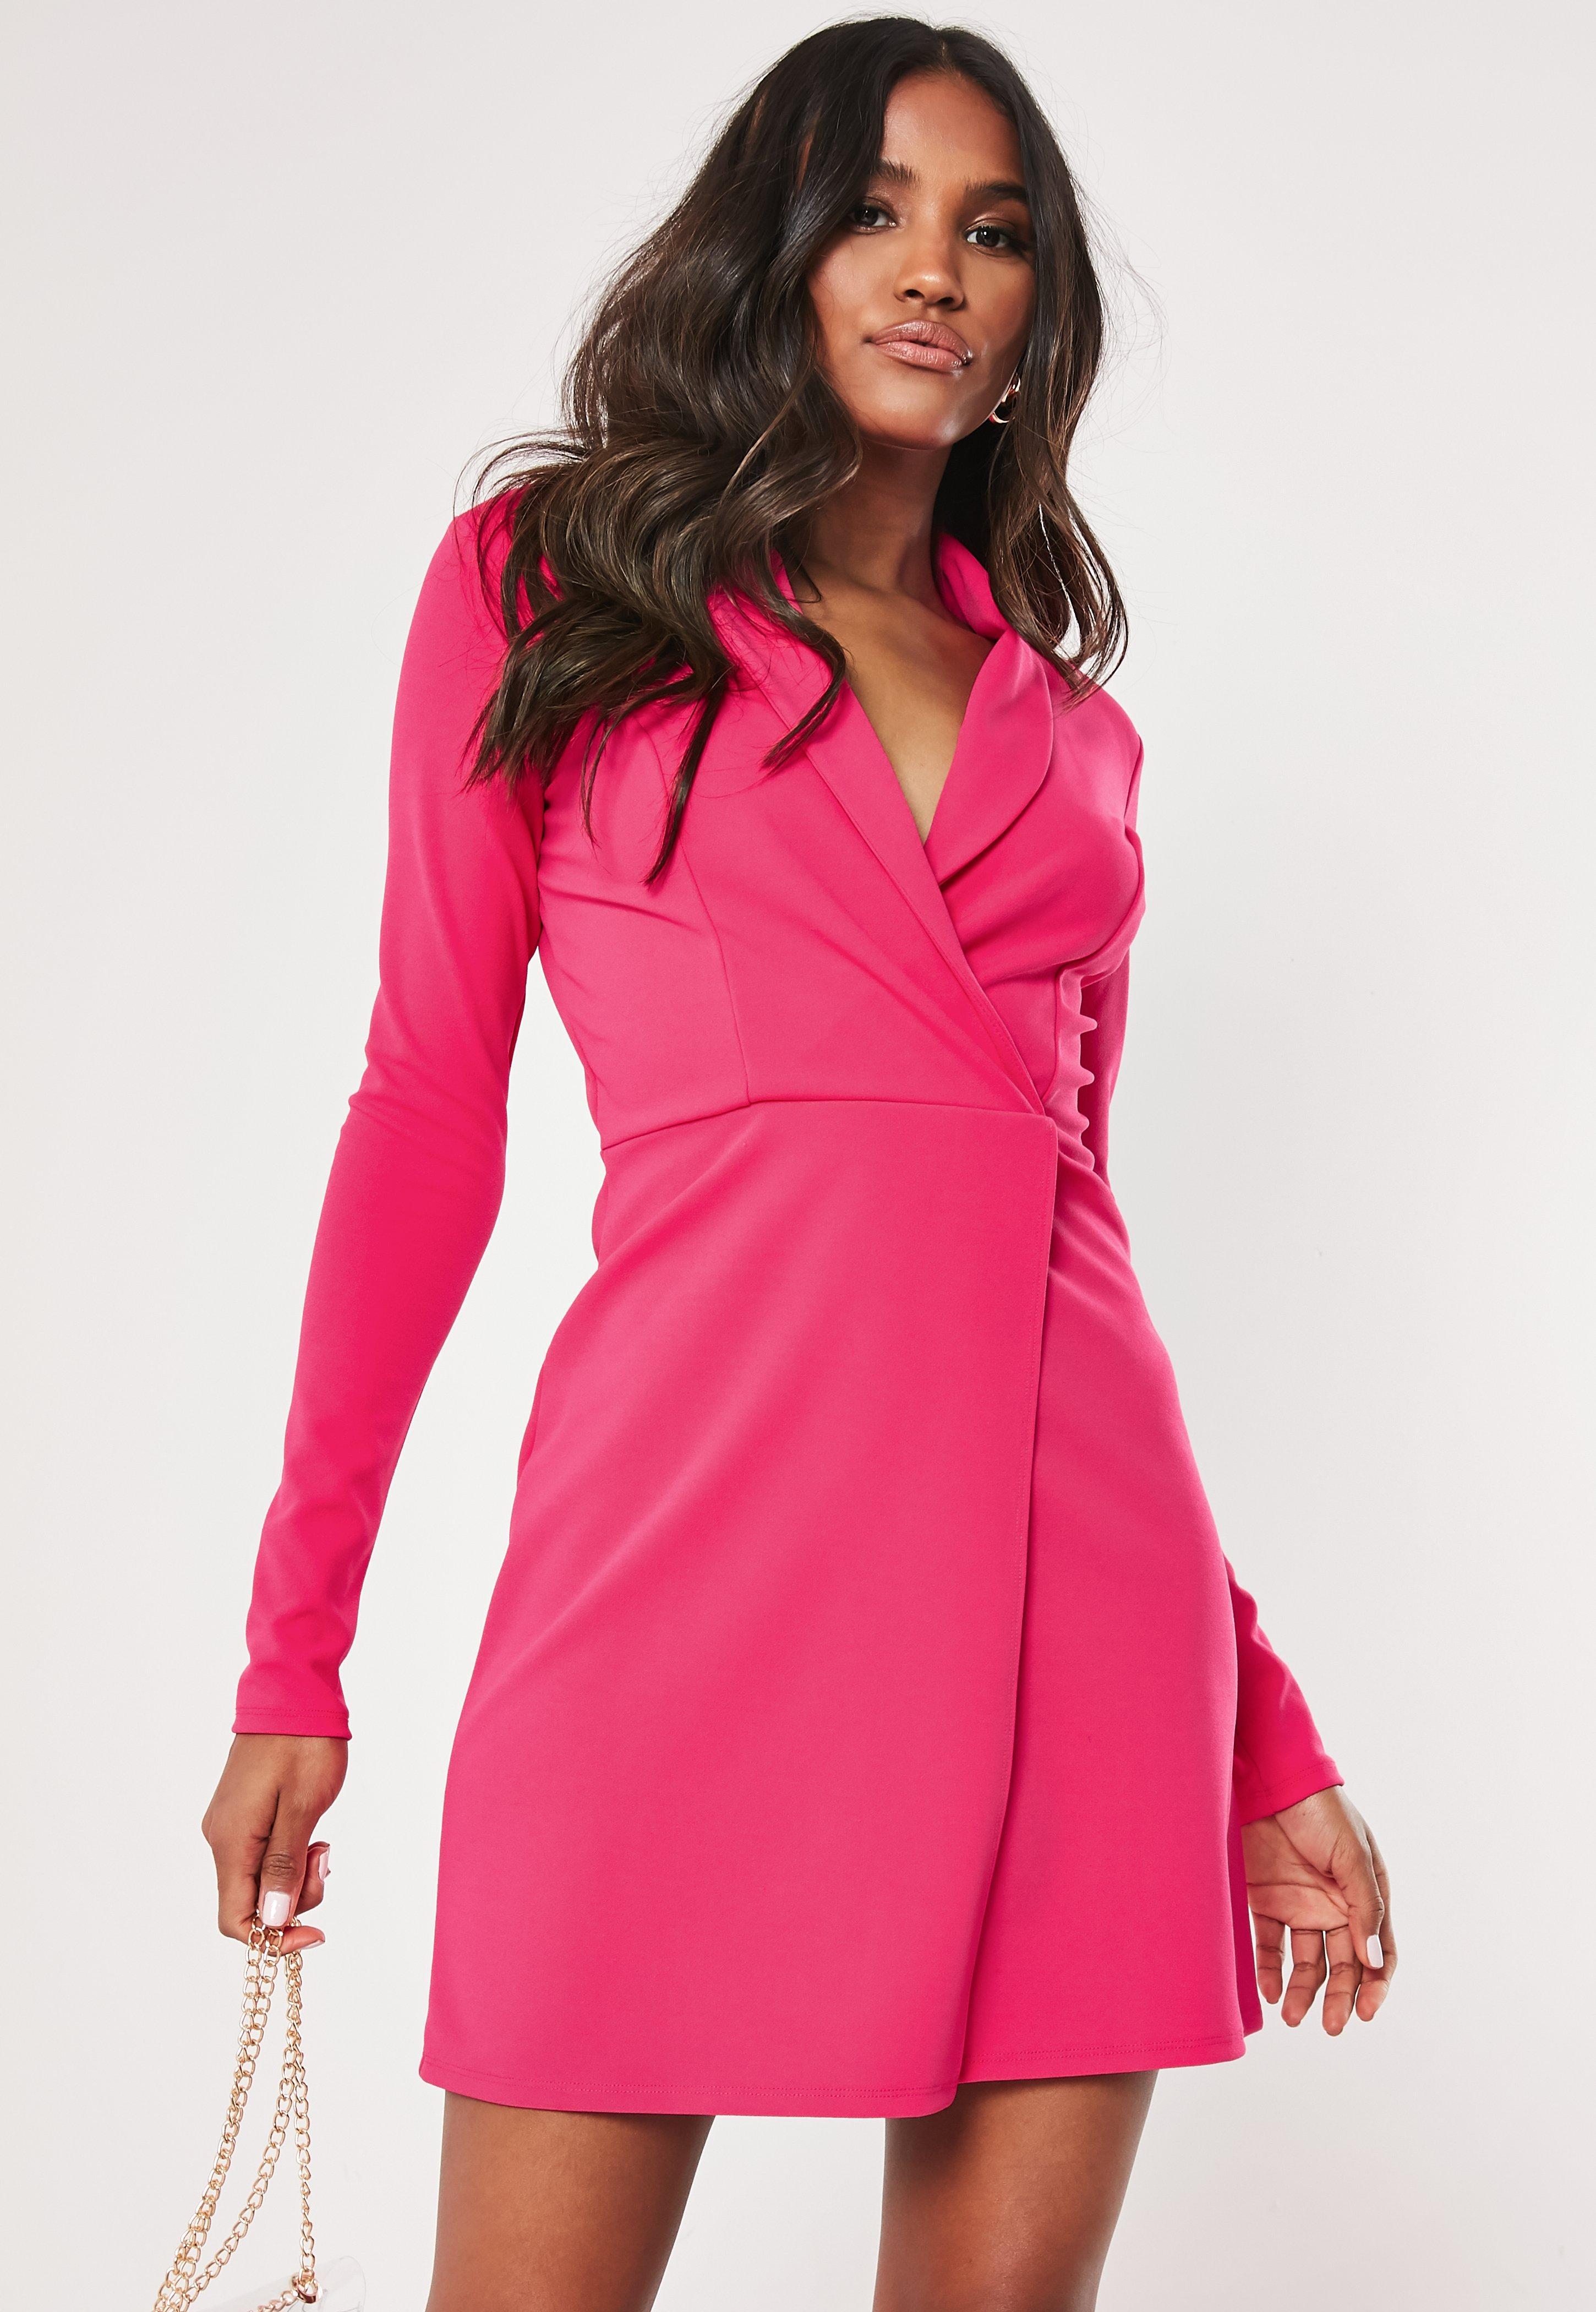 c77be9b31a8 Blazer Dresses